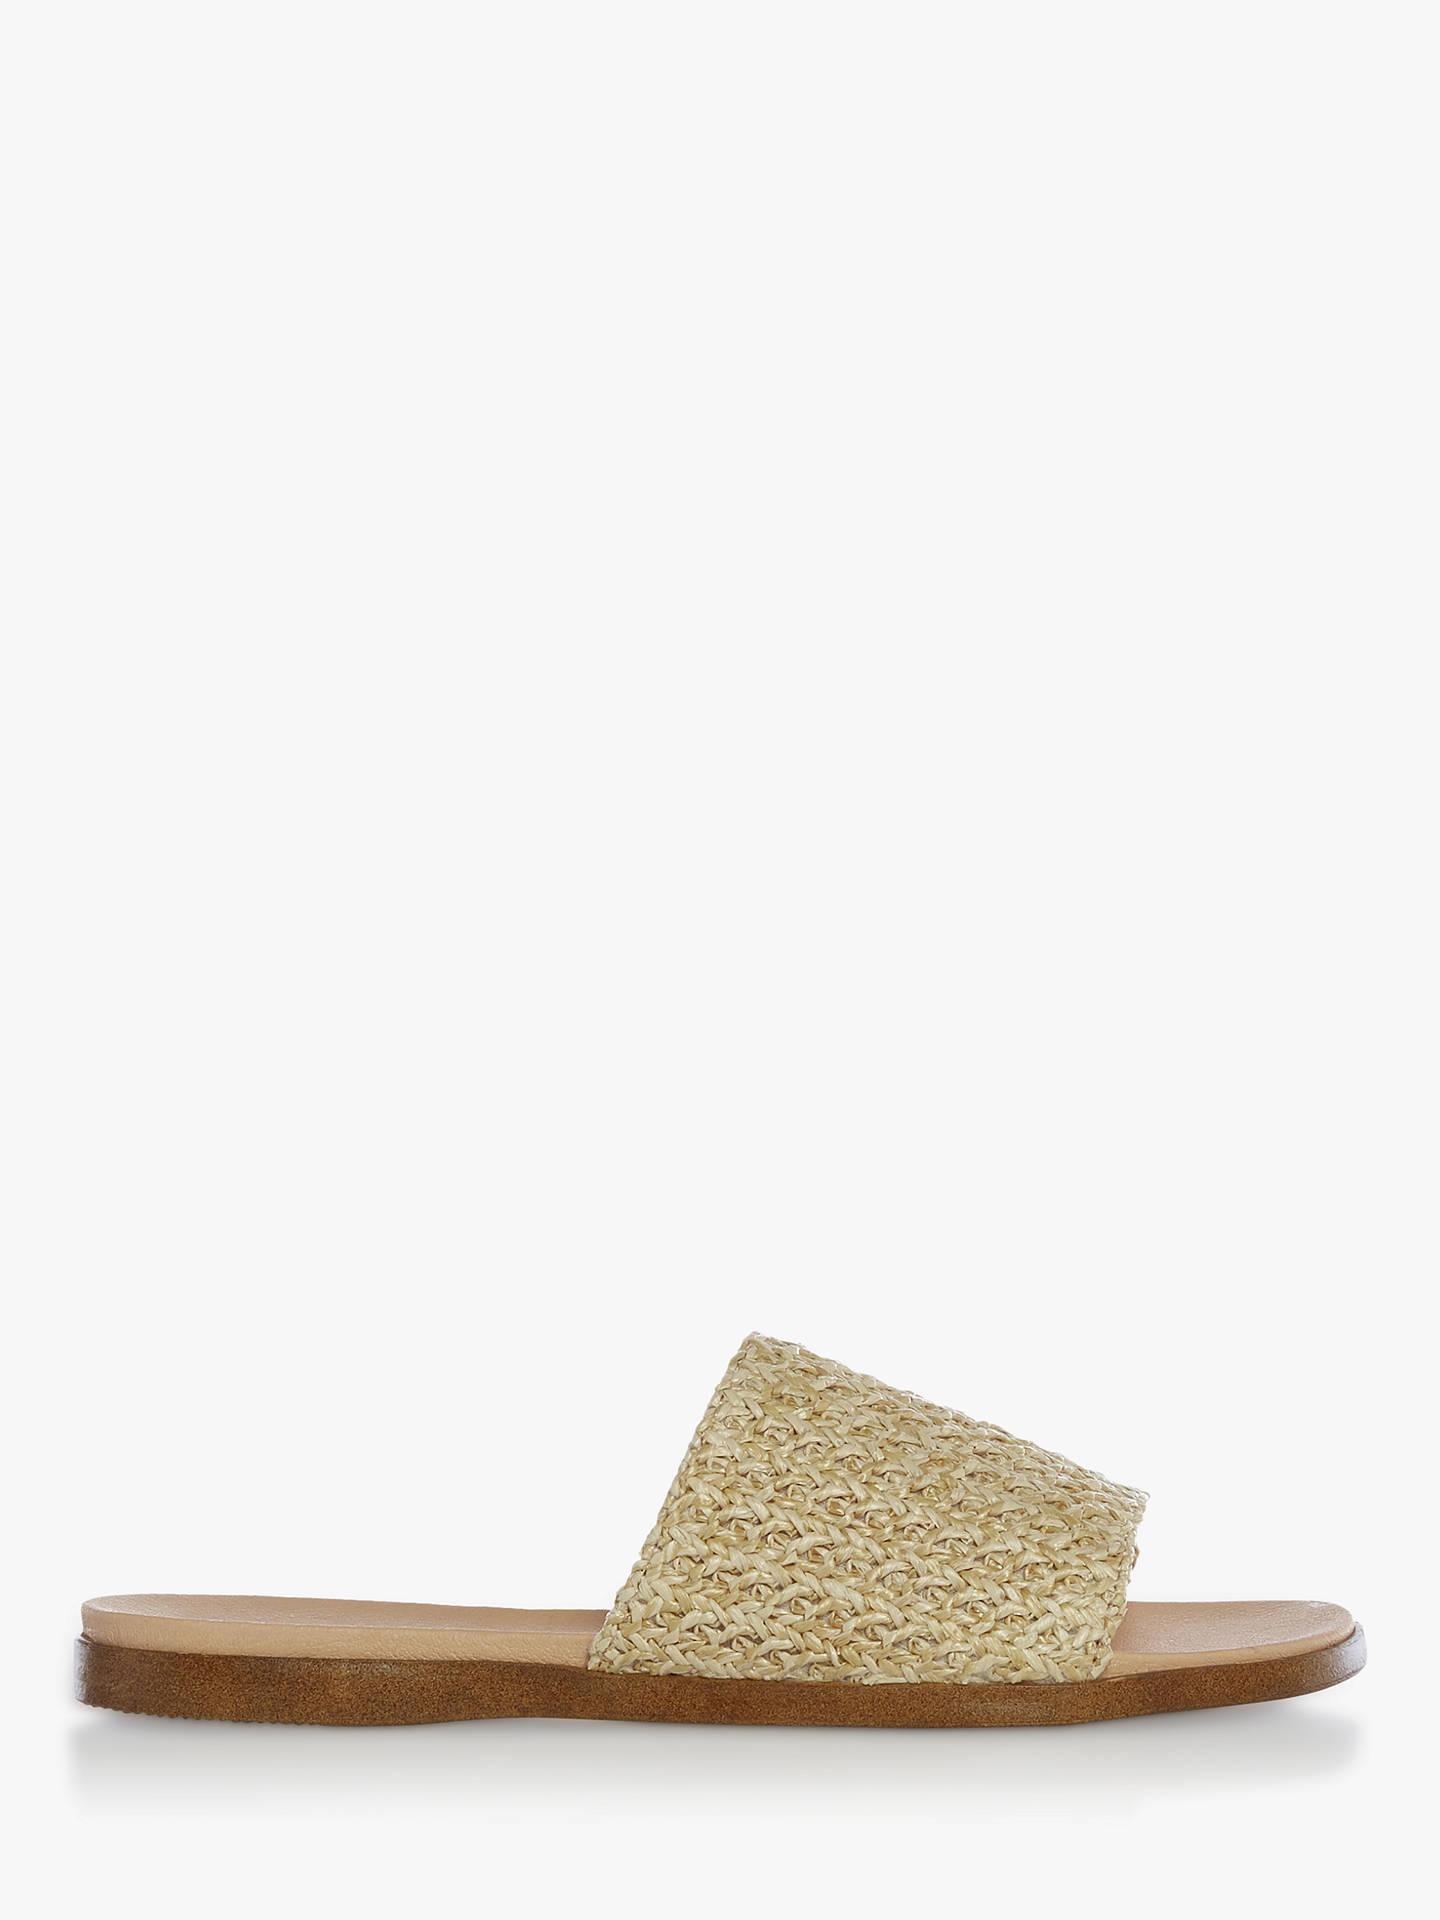 99ac2894b54 Steve Madden Oceana Slider Sandals, Natural Raffia